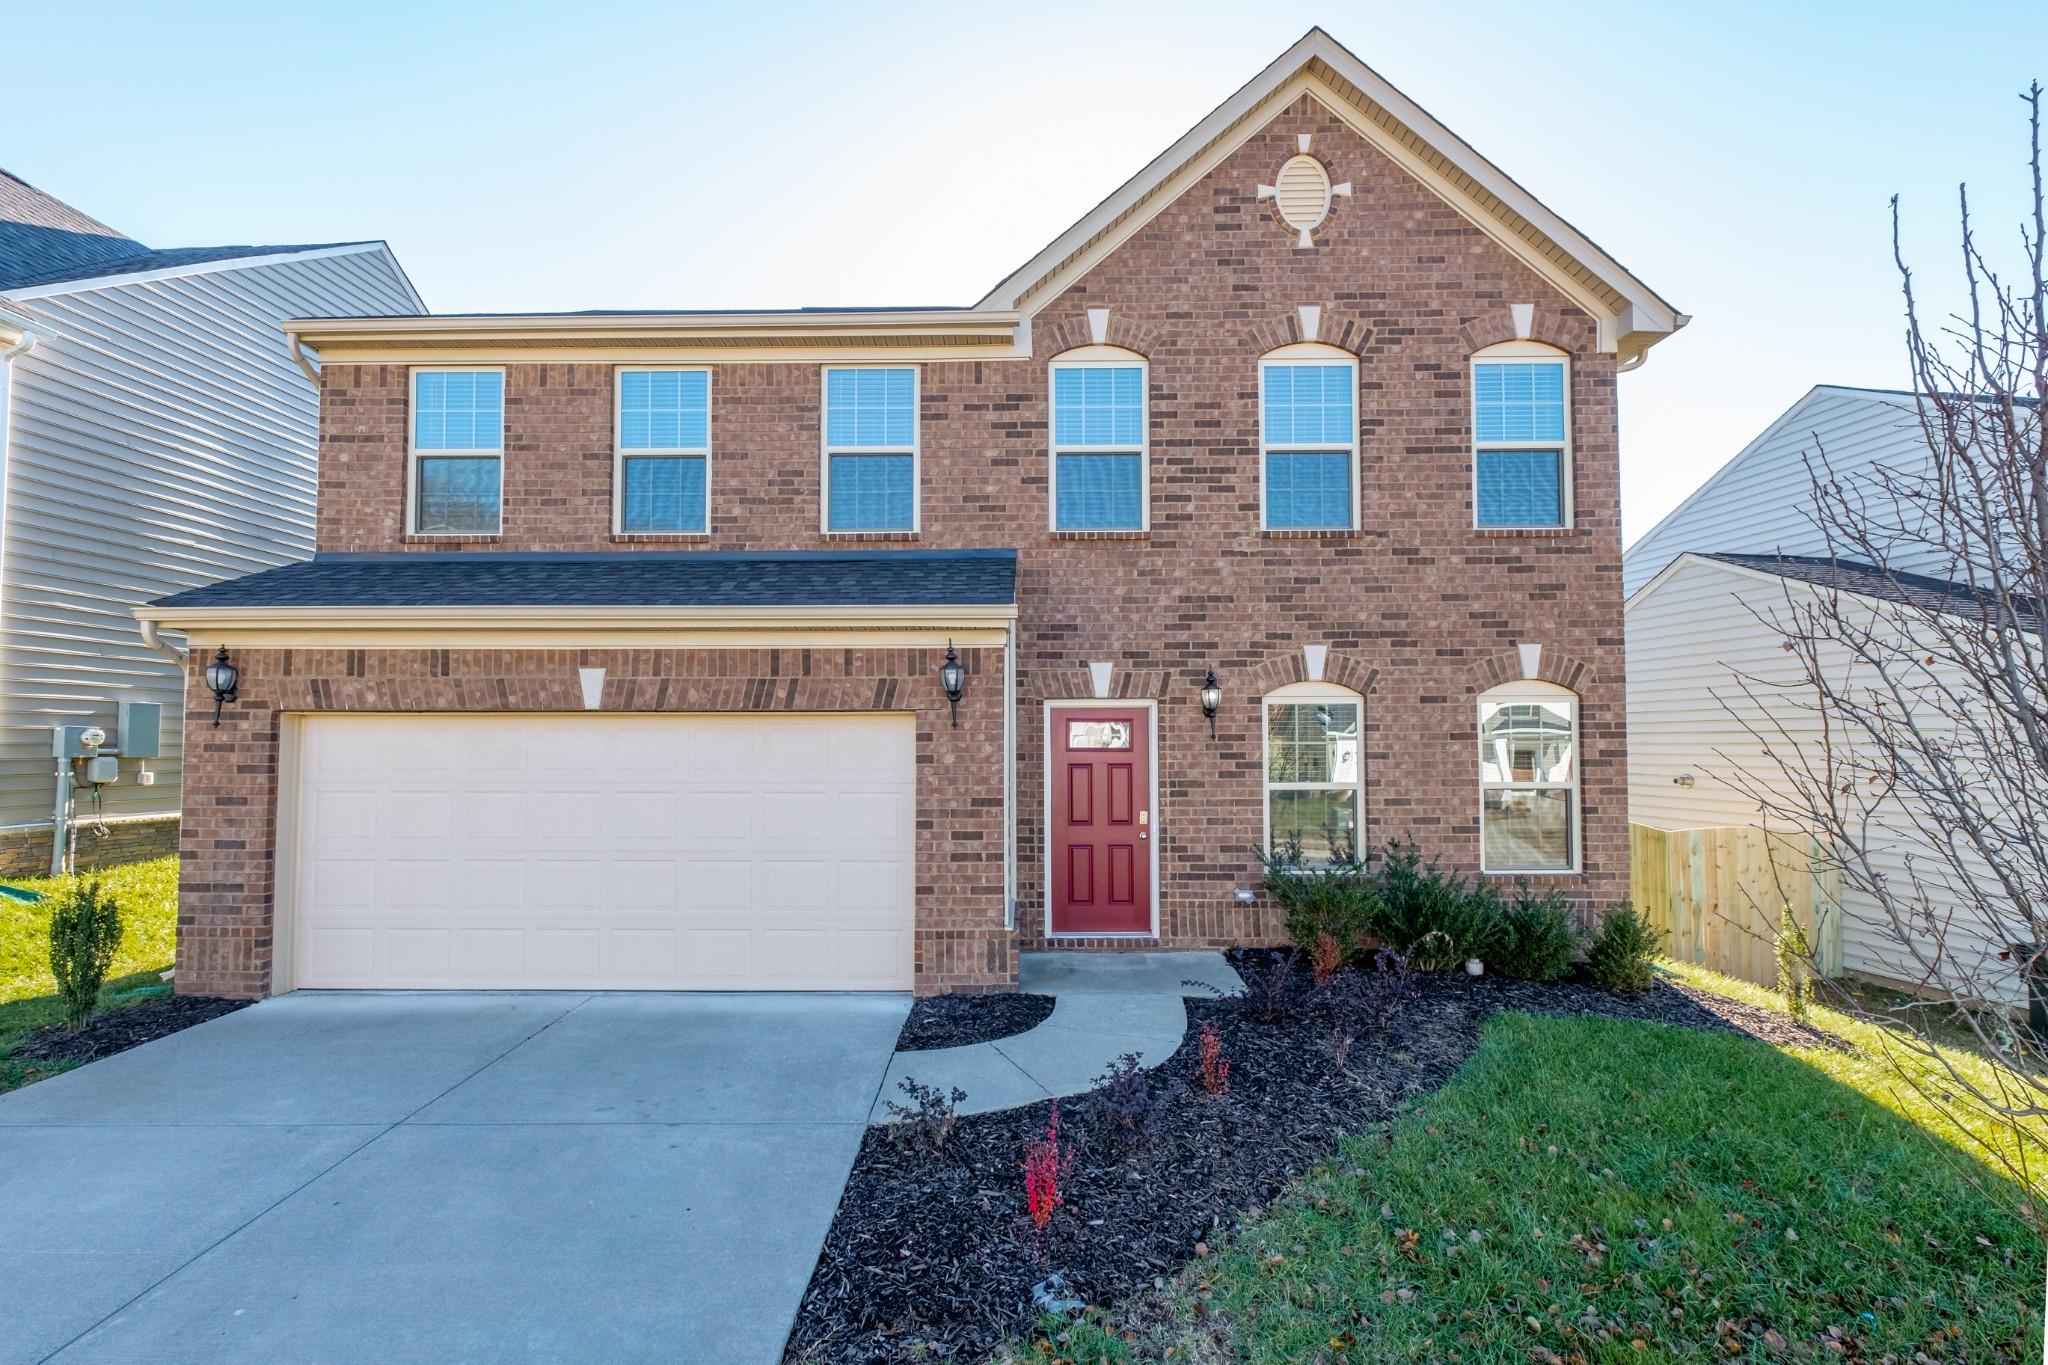 475 Parmley Ln, Nashville, TN 37207 - Nashville, TN real estate listing